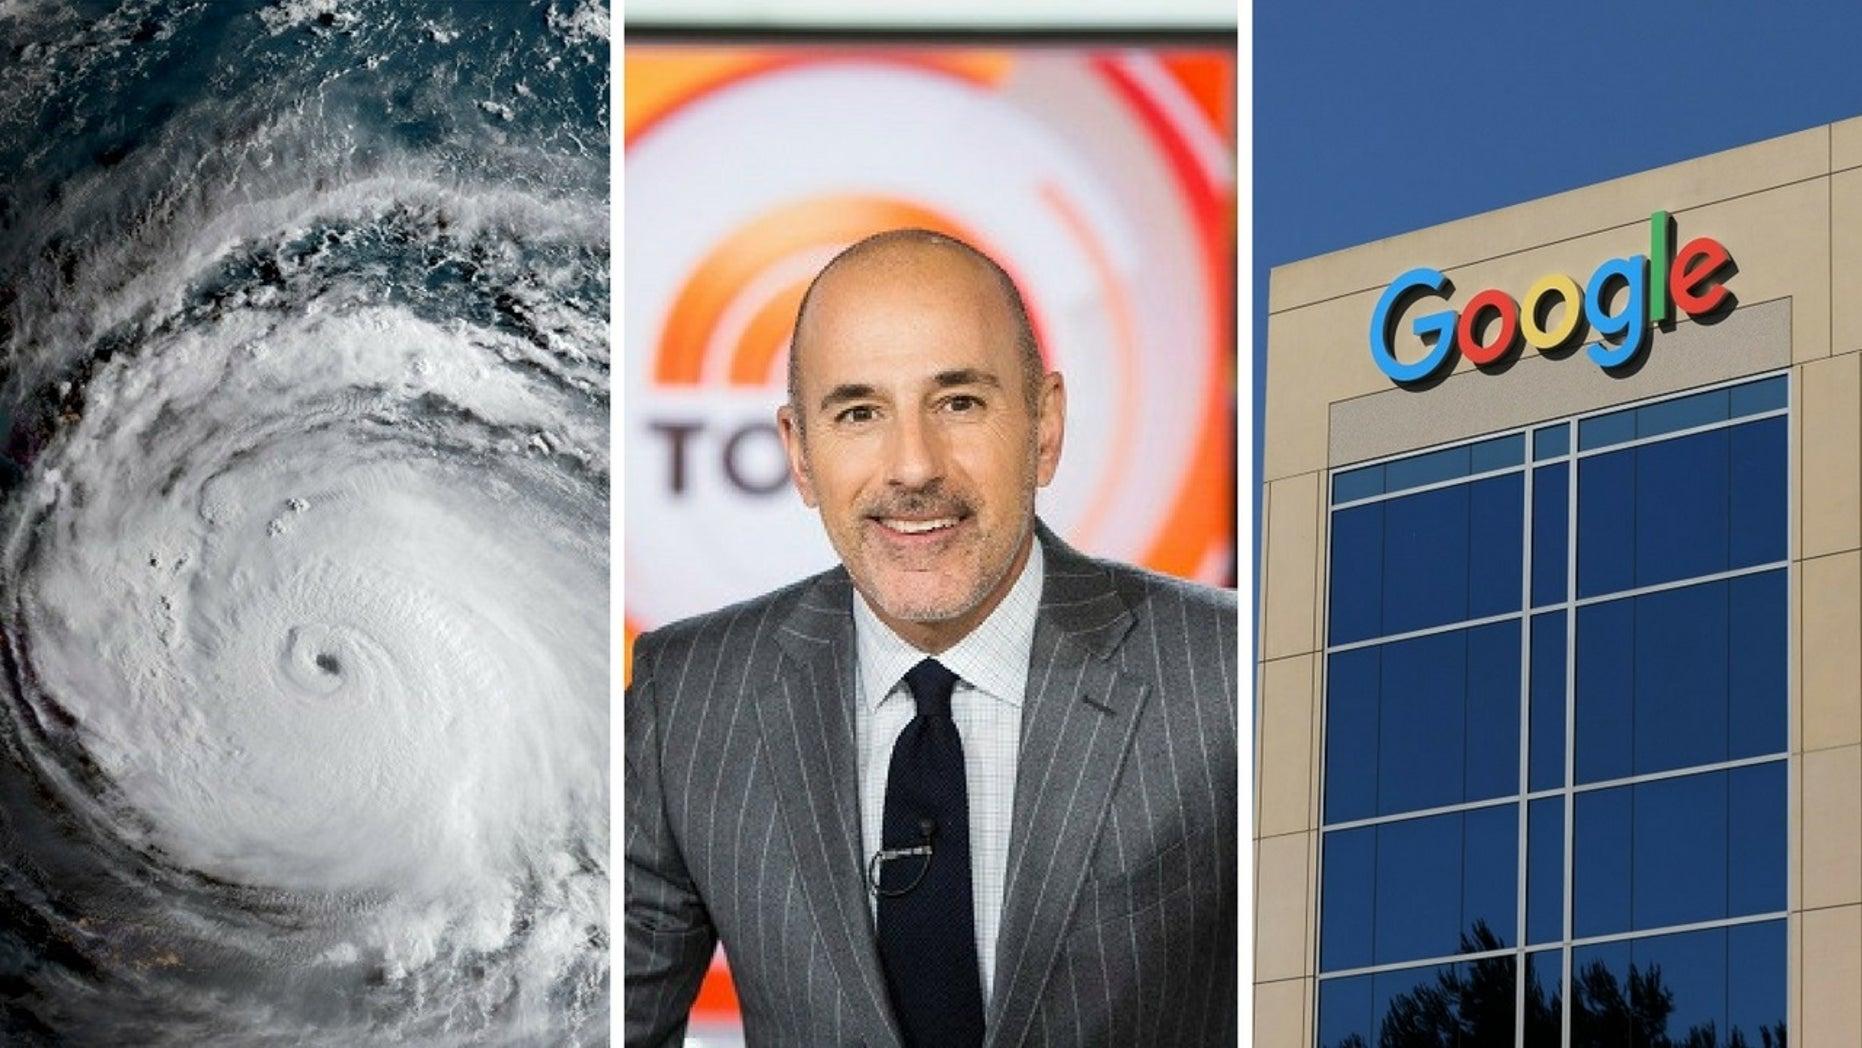 Google revealed Matt Lauer and Hurricane Irma were 2017's top searches.